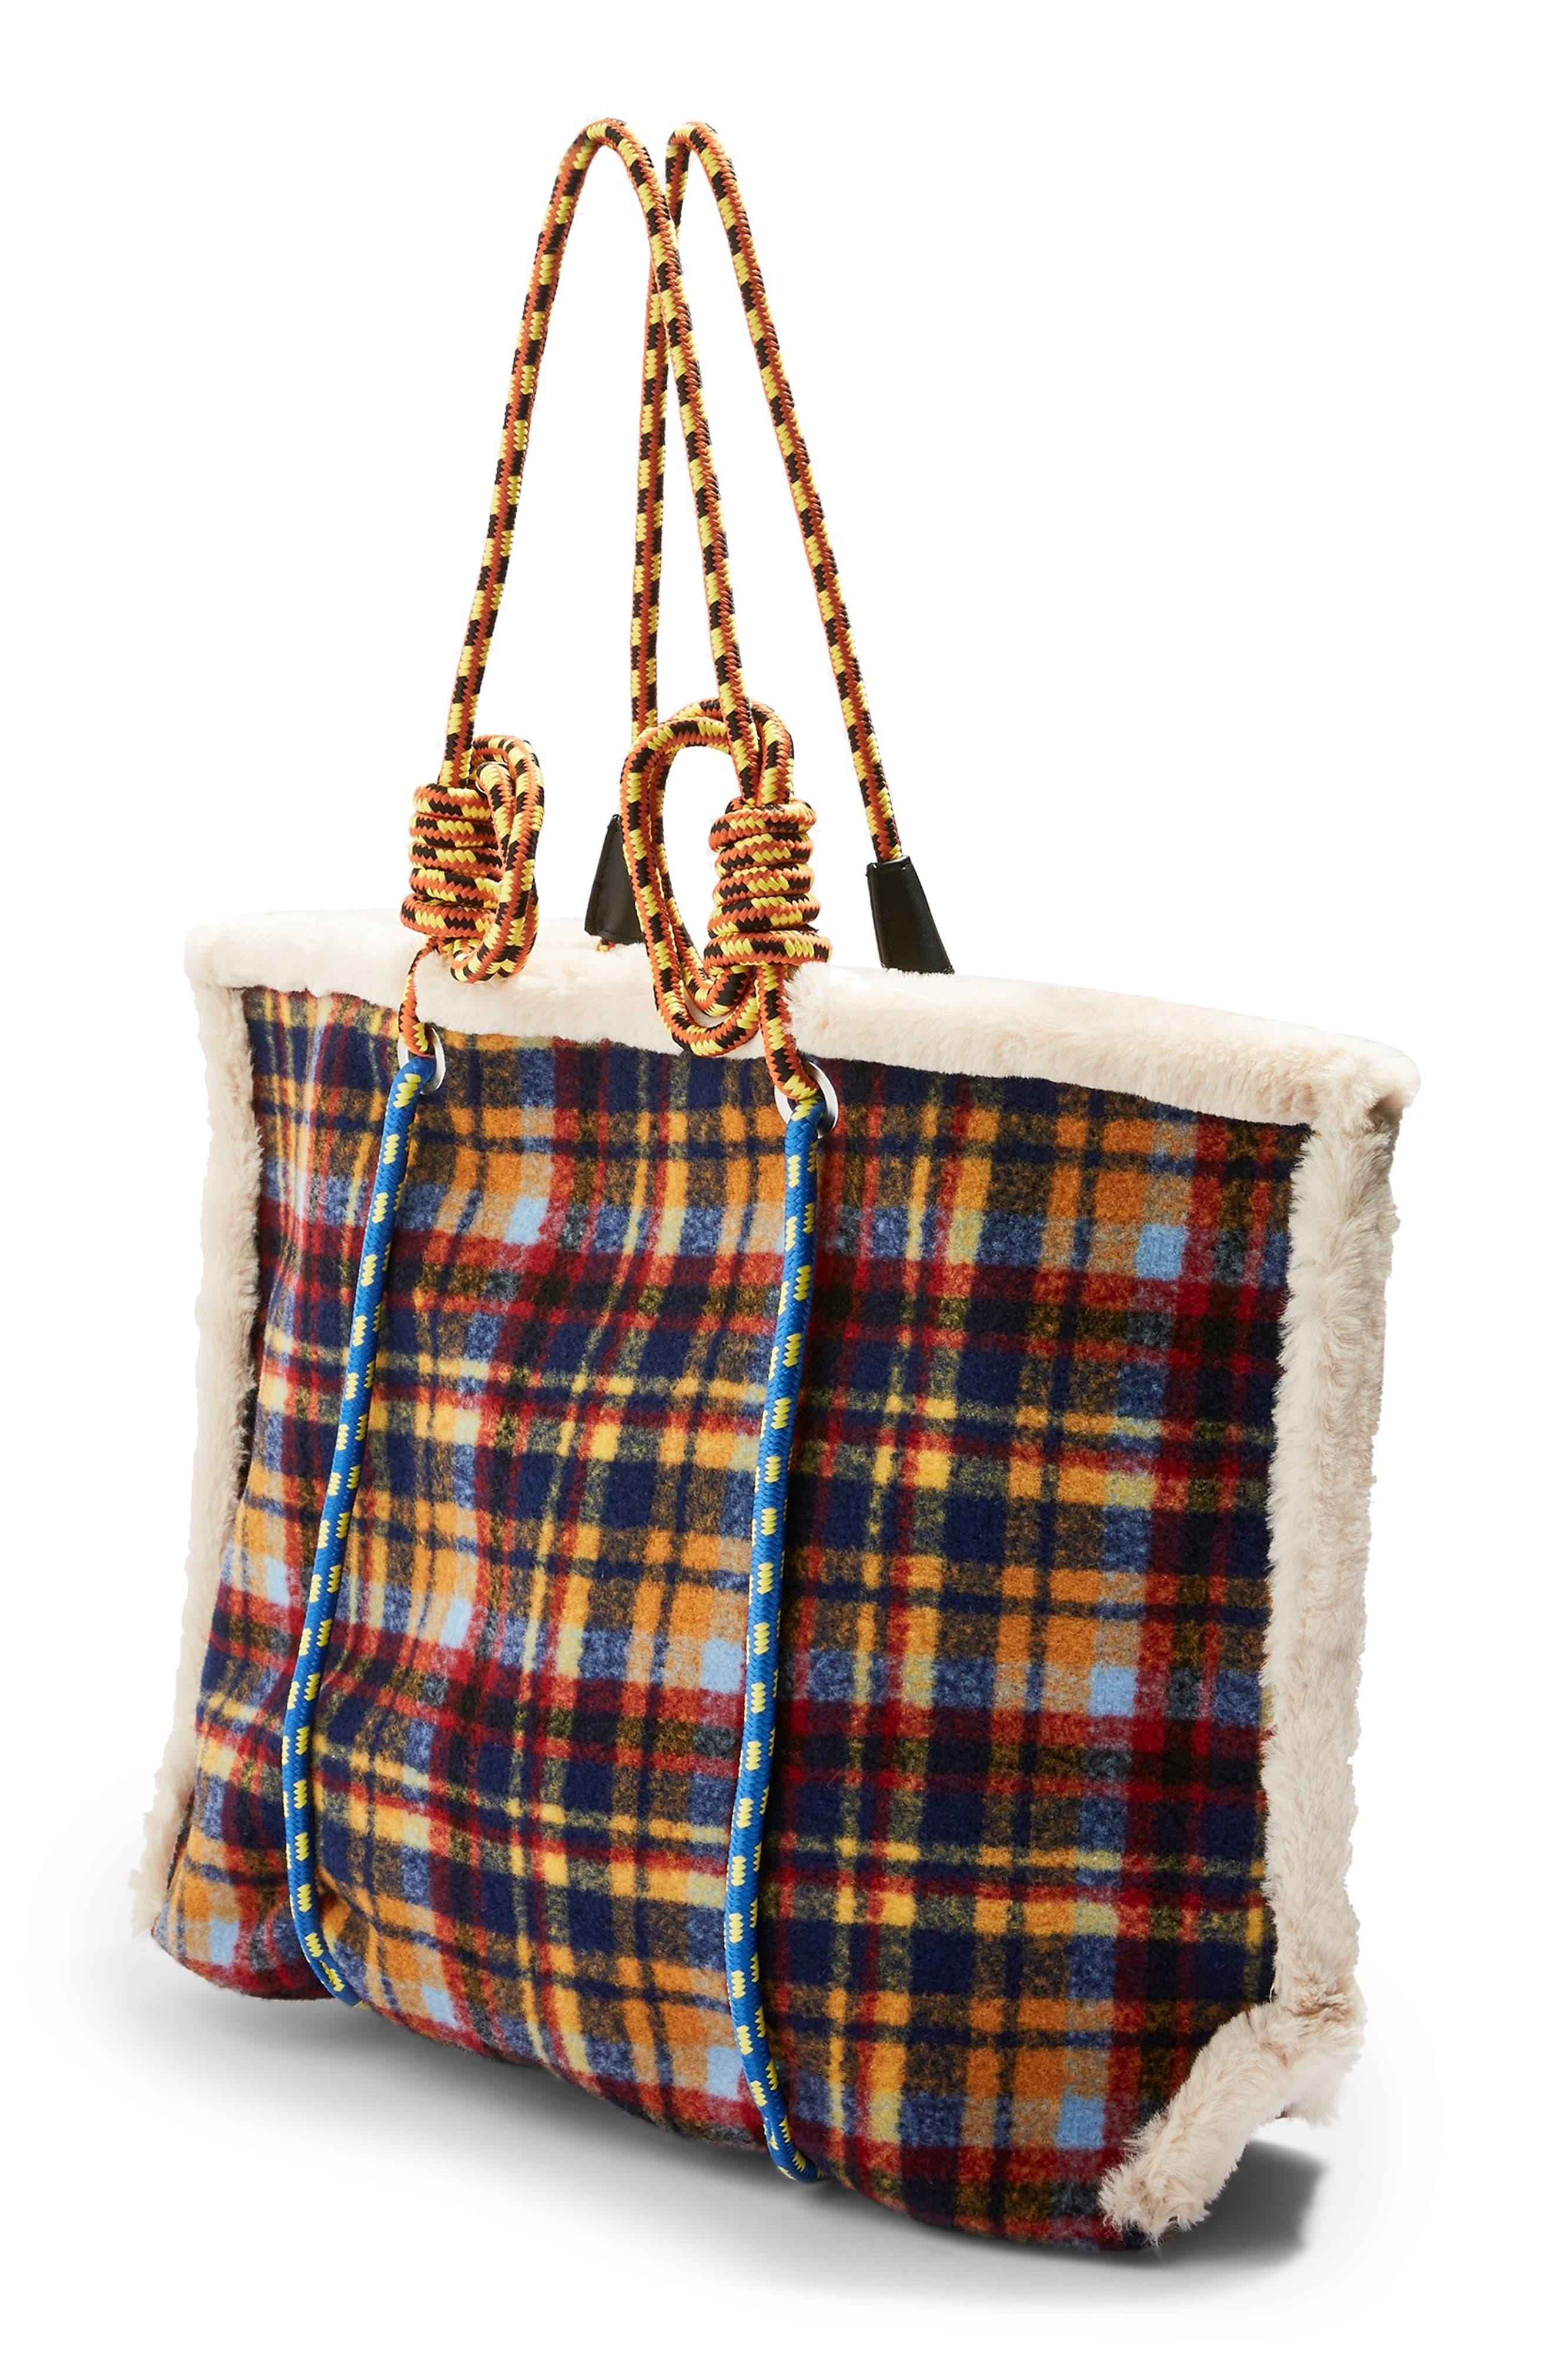 Blanket Rope Tote Bag,                             Alternate thumbnail 3, color,                             BLUE MULTI